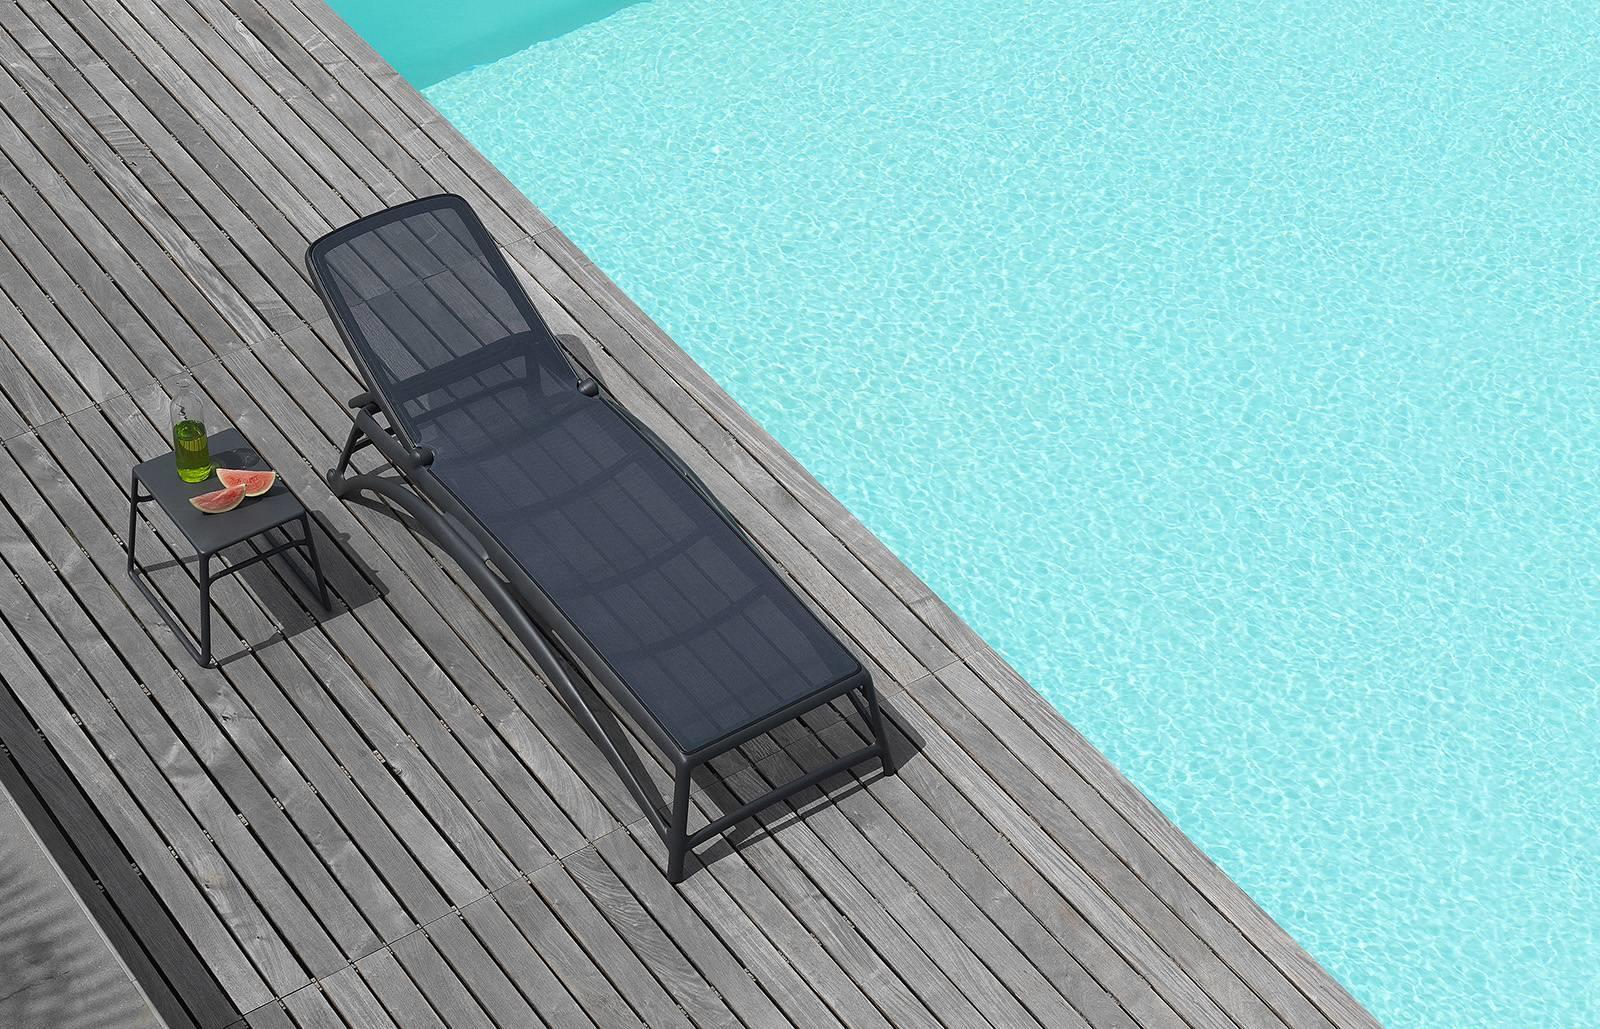 Leżak na basenie